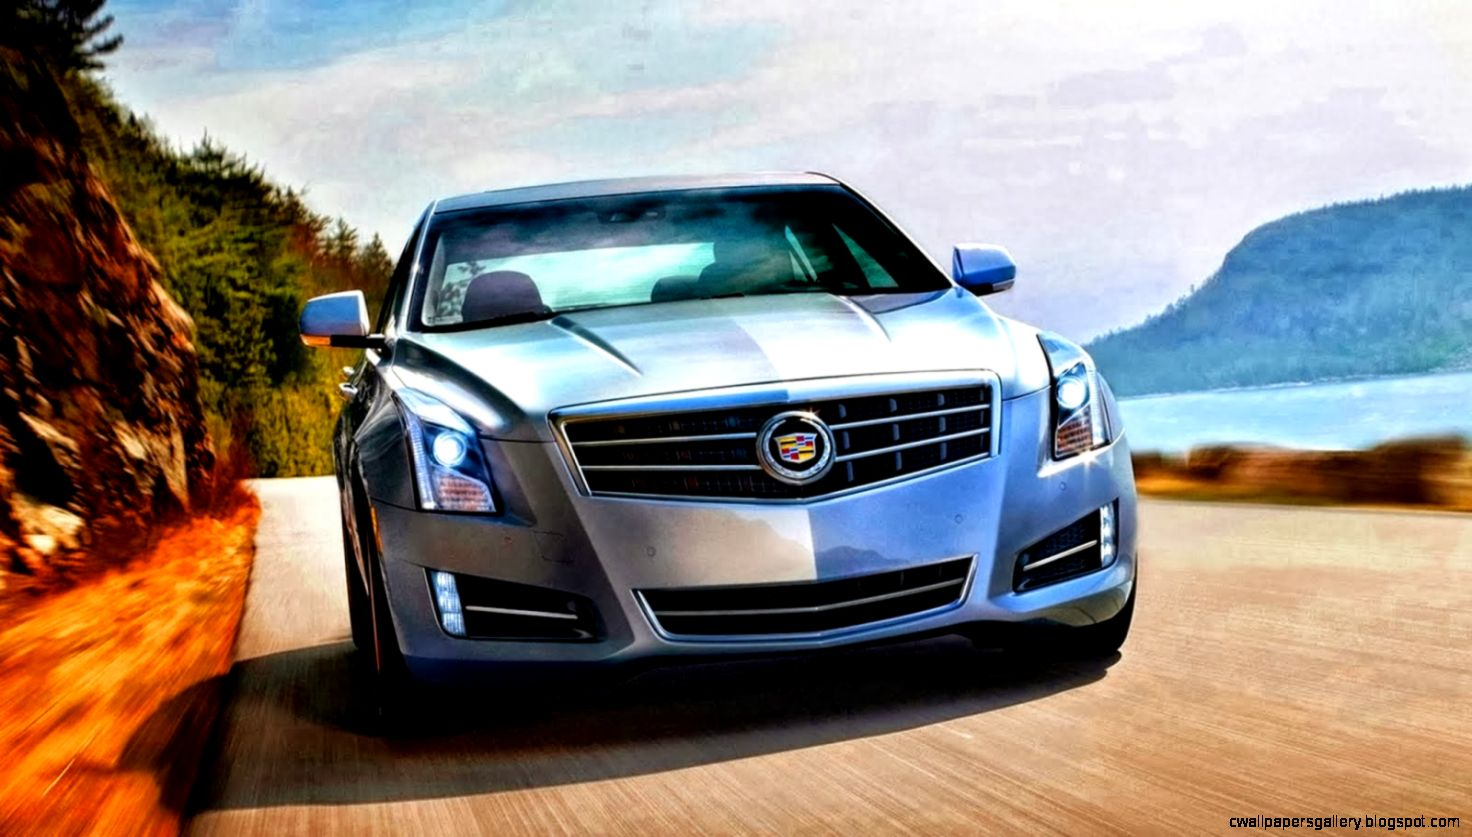 top 10 least reliable cars the short list autos post. Black Bedroom Furniture Sets. Home Design Ideas